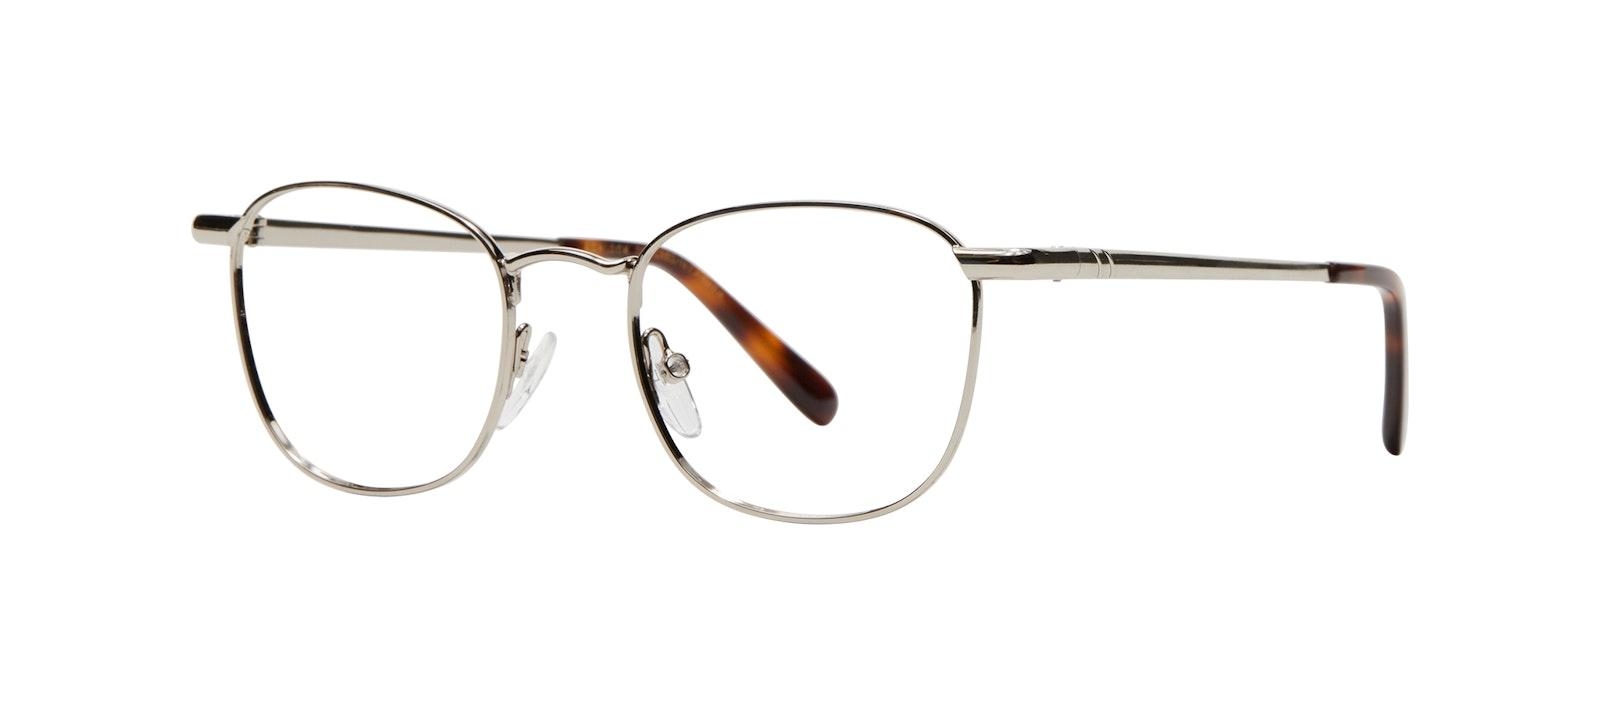 Affordable Fashion Glasses Square Eyeglasses Men Women Apex S Silver Tilt